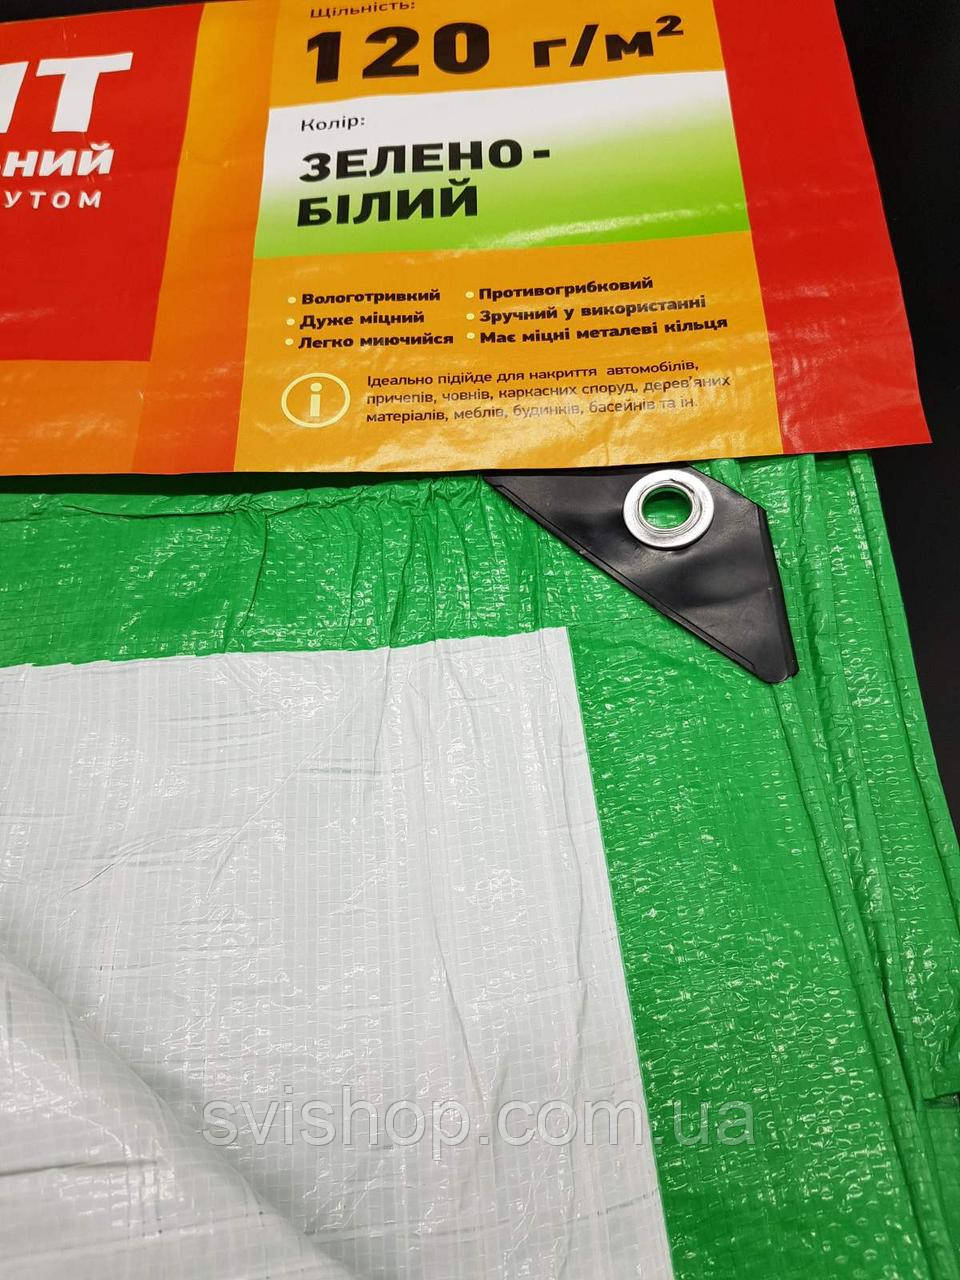 Тент для накрытия 8х10 от дождя и снега, затеняющий 120 г / м2. Зеленый цвет.